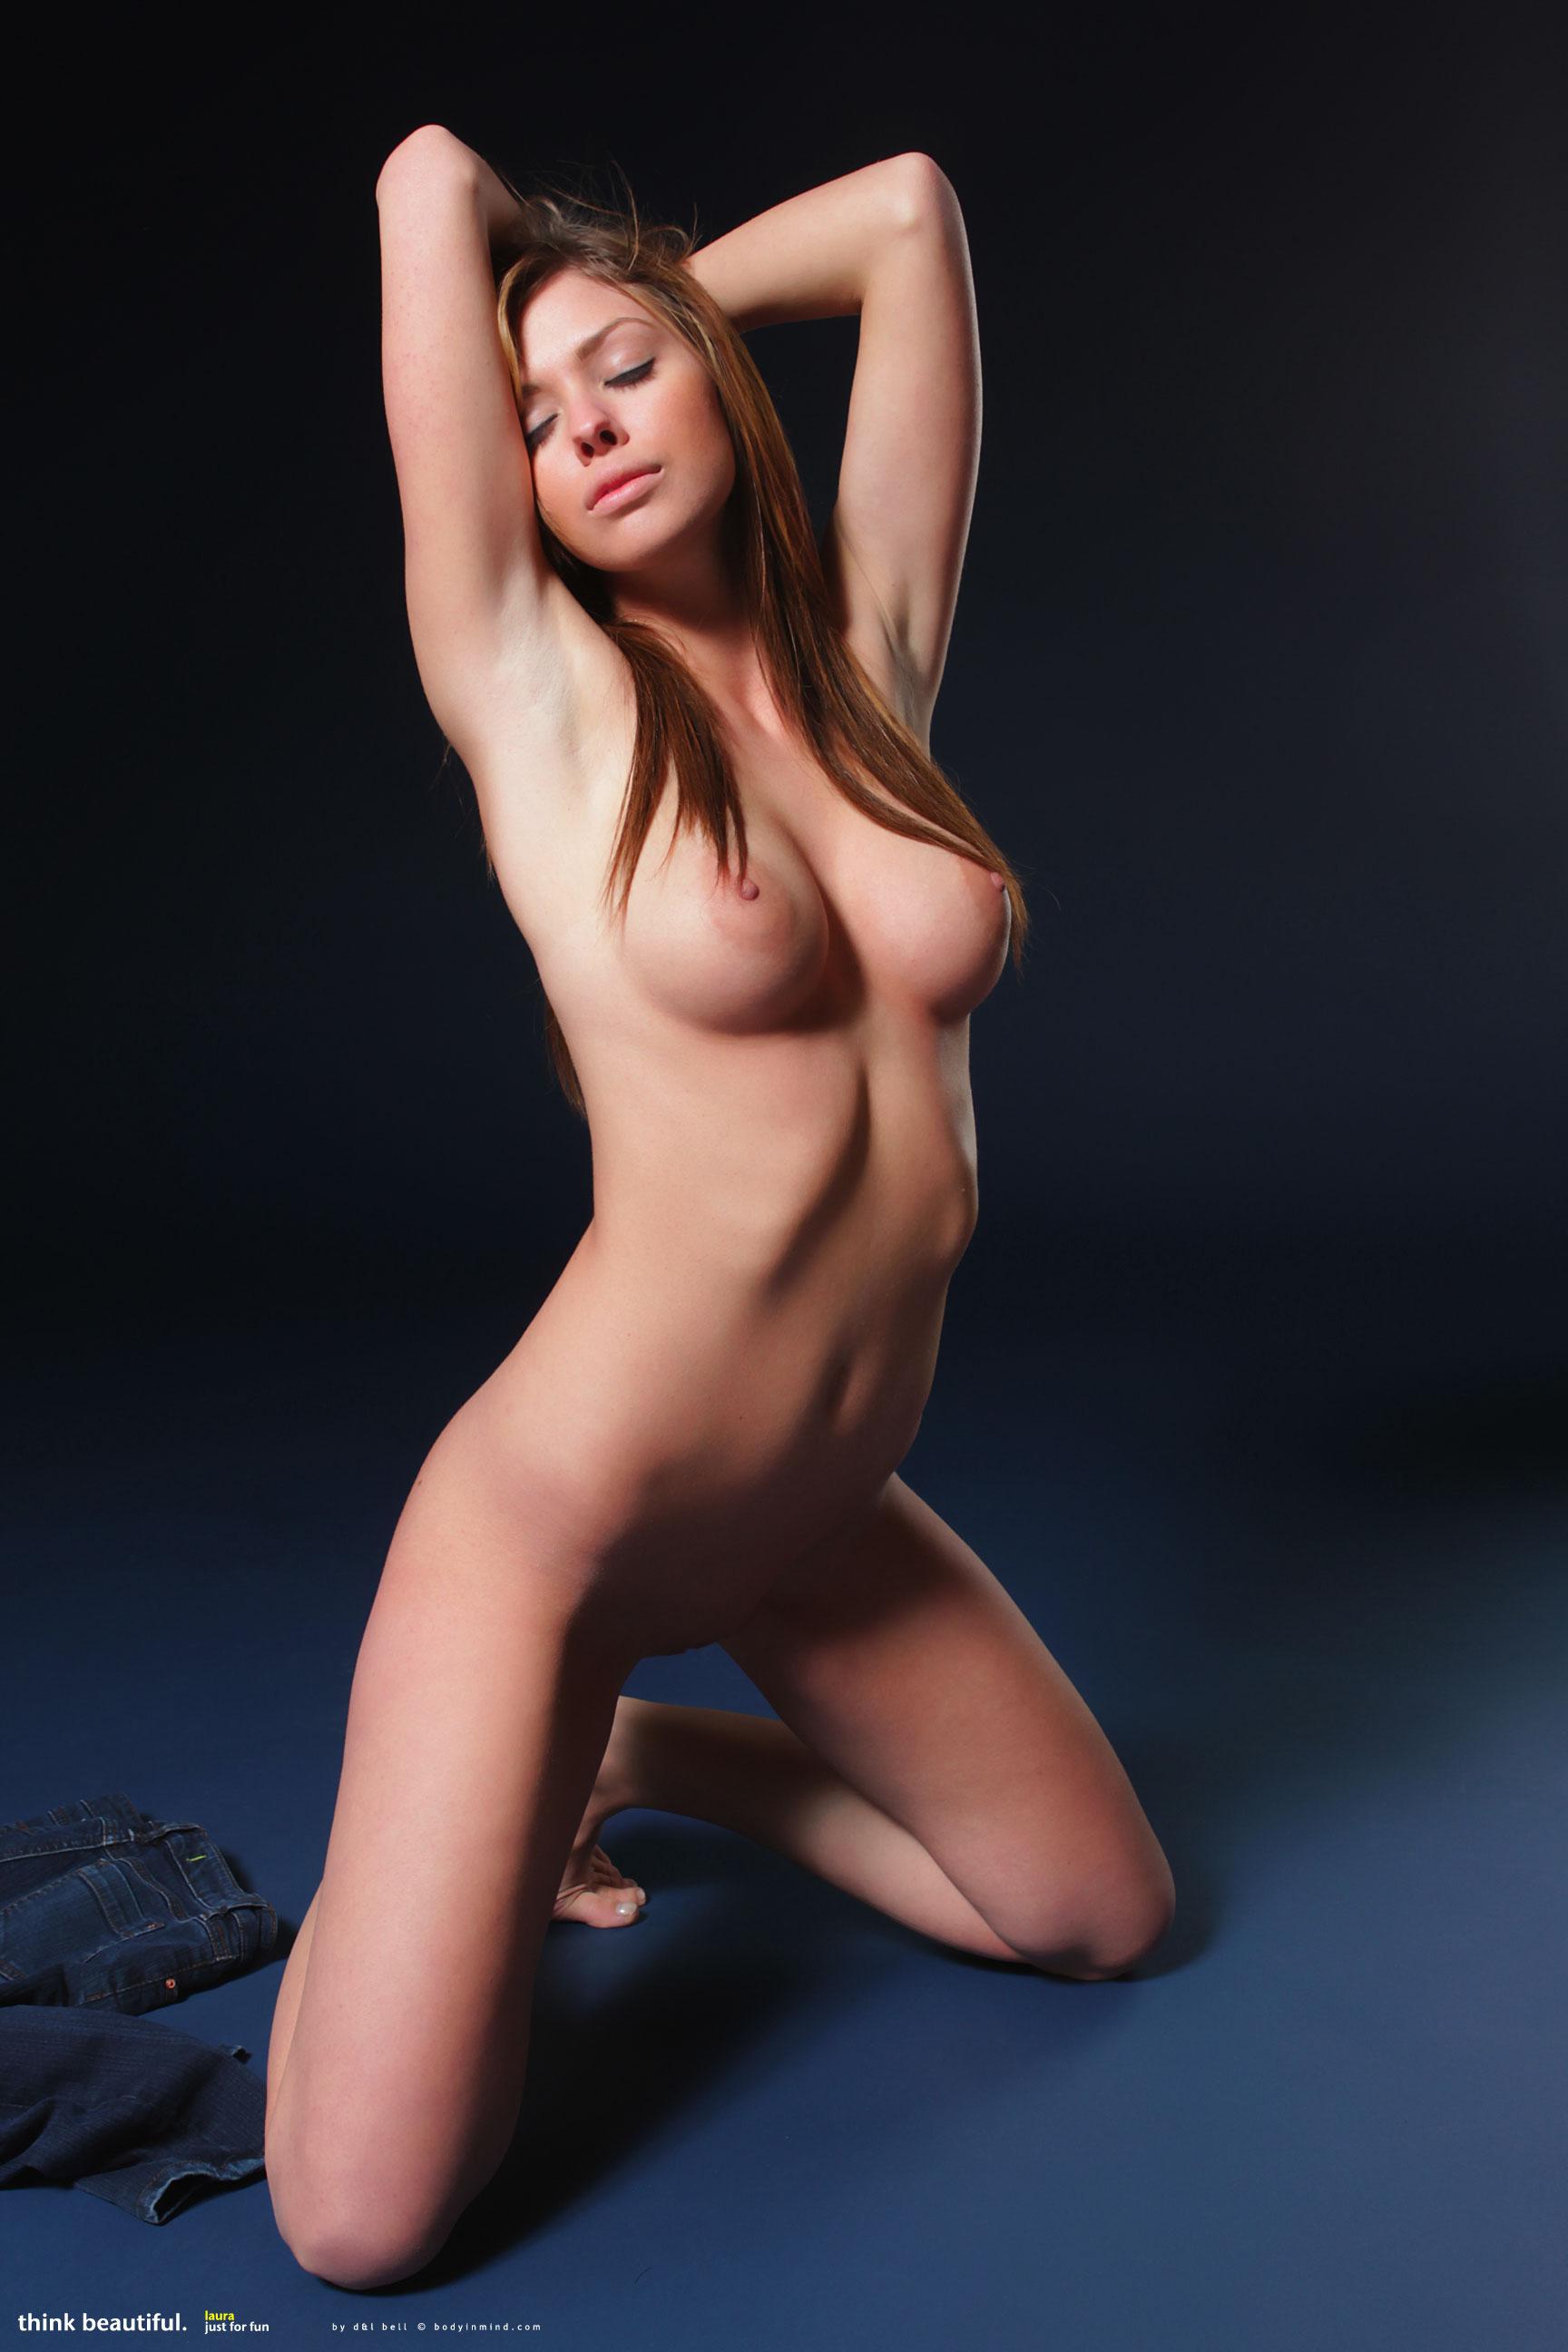 Danielle staub naked pussy